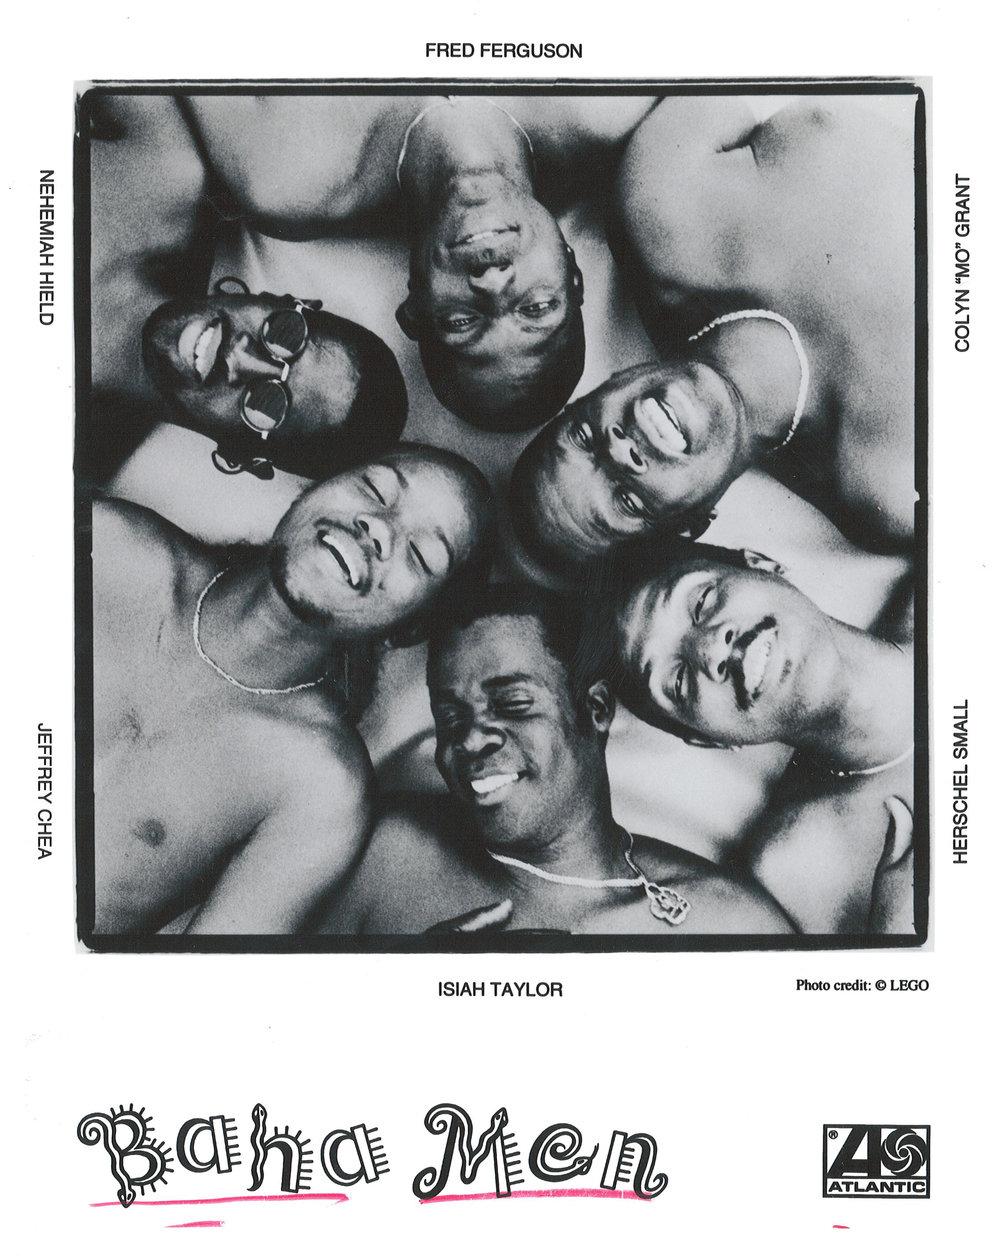 WLWLTDOO-1994-BAHA_MEN-PROMO_GLOSSY-A.jpg